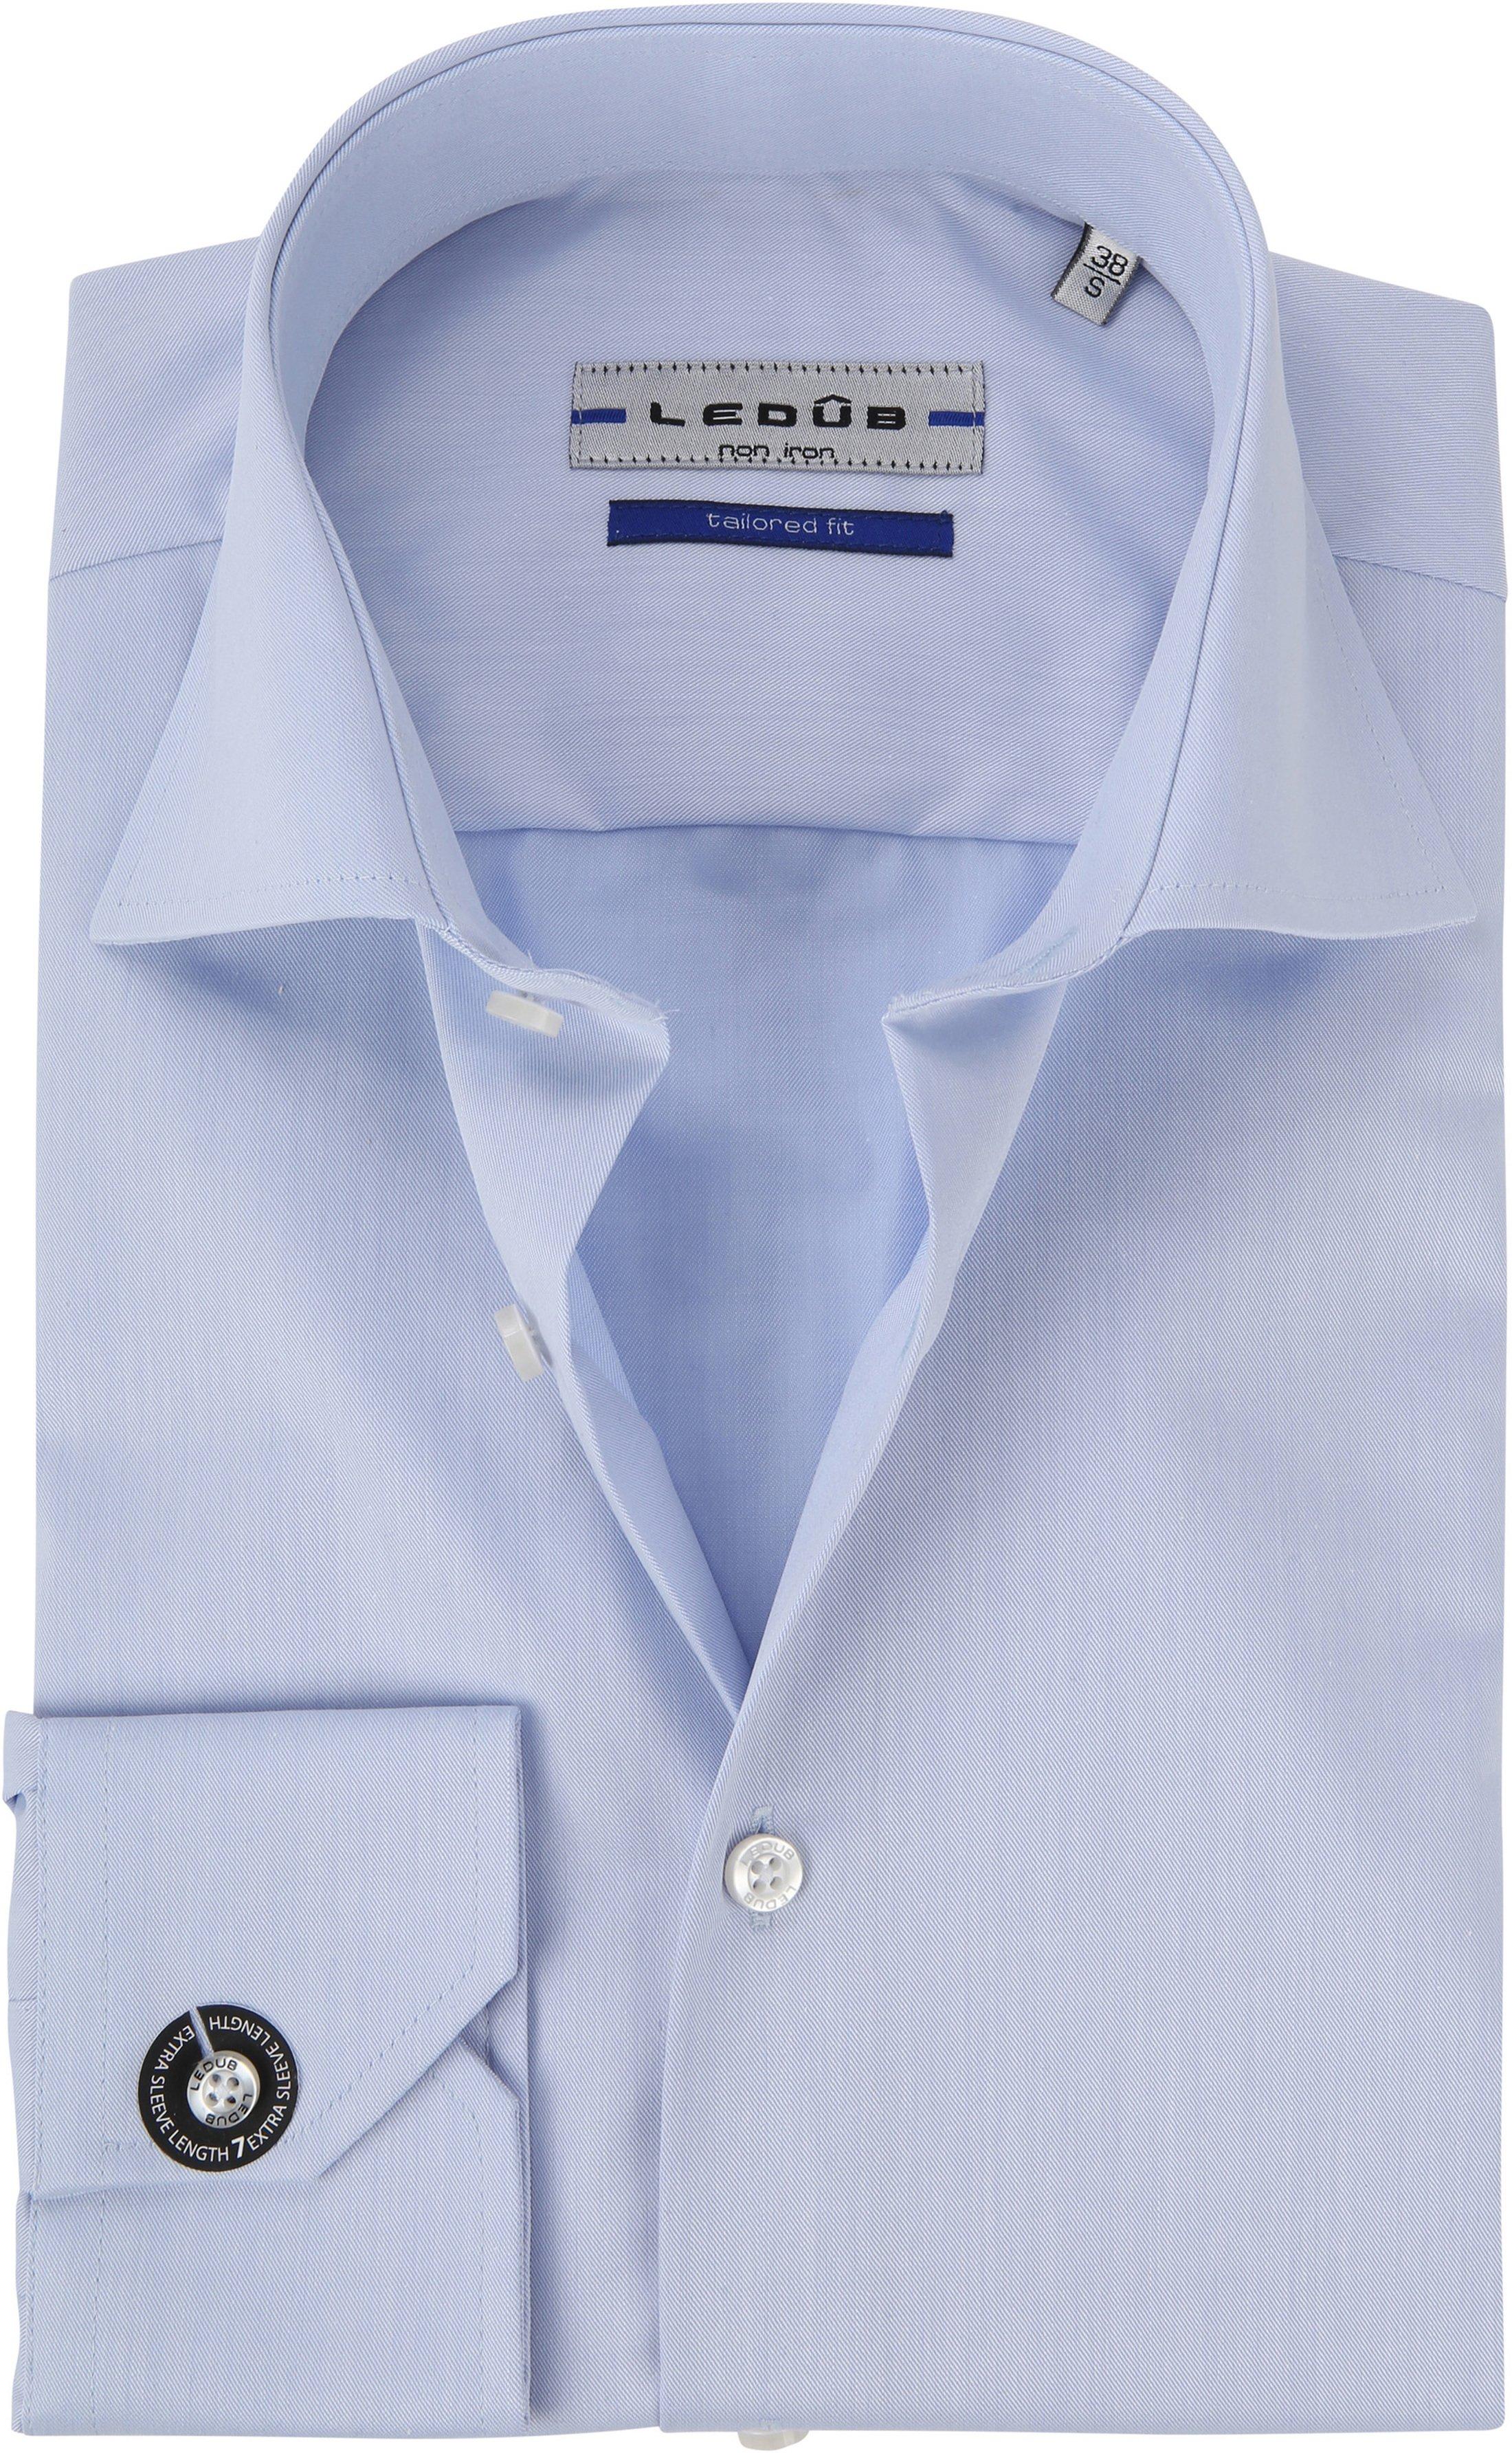 Ledub Strijkvrij Overhemd Blauw Sleeve 7 foto 0